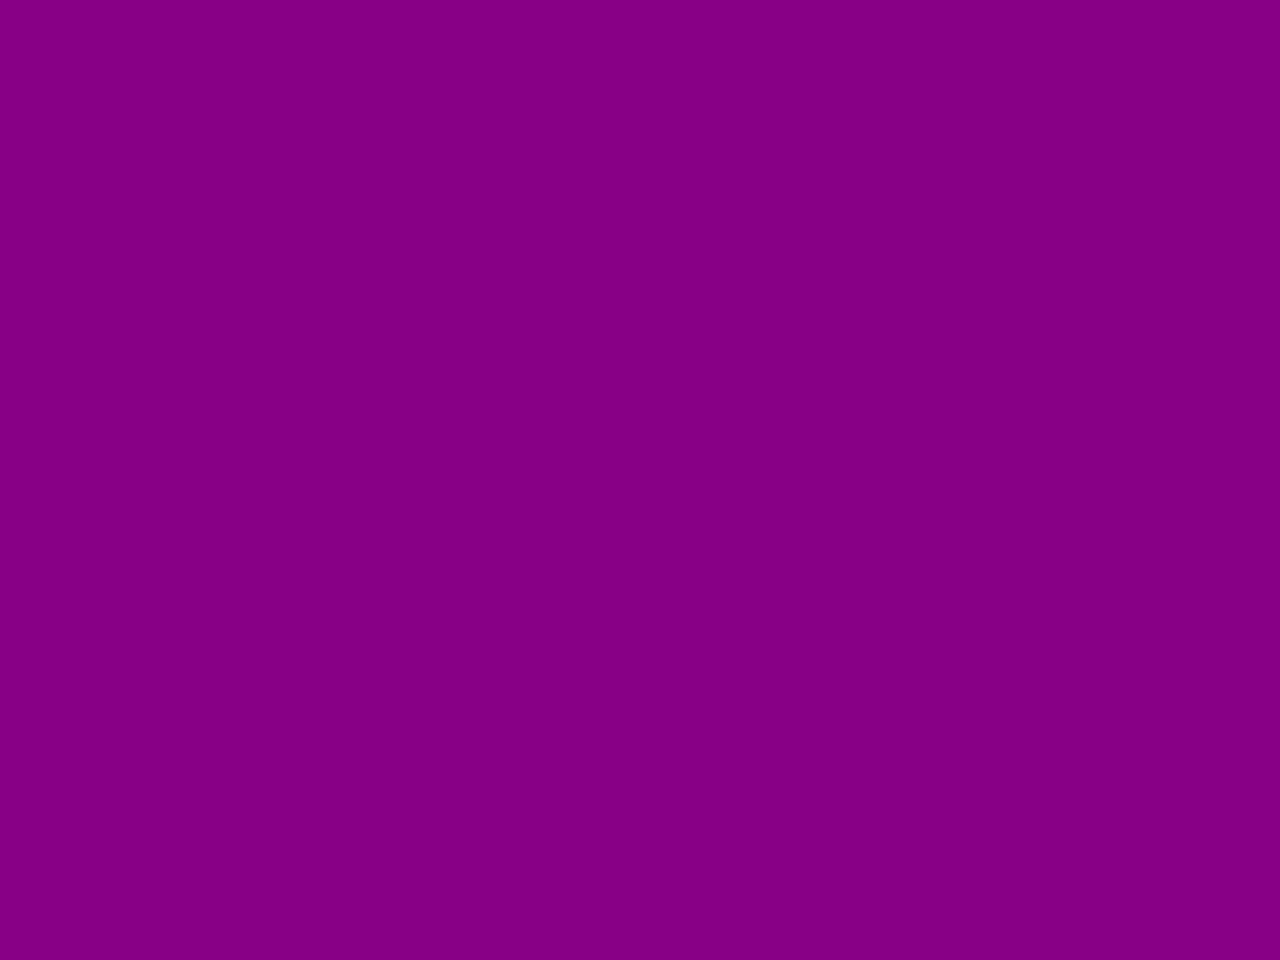 1280x960 Mardi Gras Solid Color Background